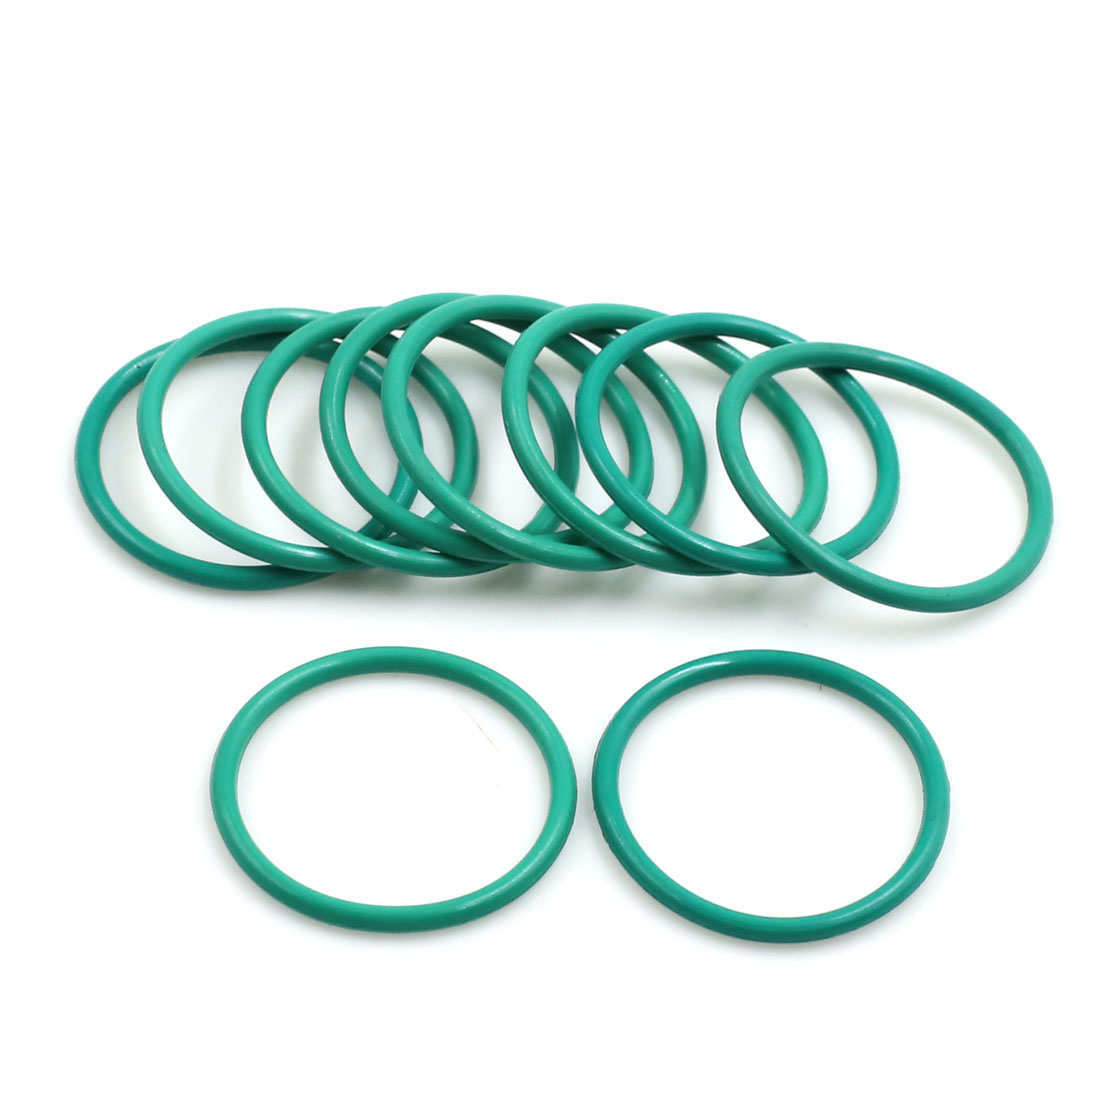 10pcs Green Universal FKM O-Ring Sealing Gasket Washer for Car 26mm x 2mm